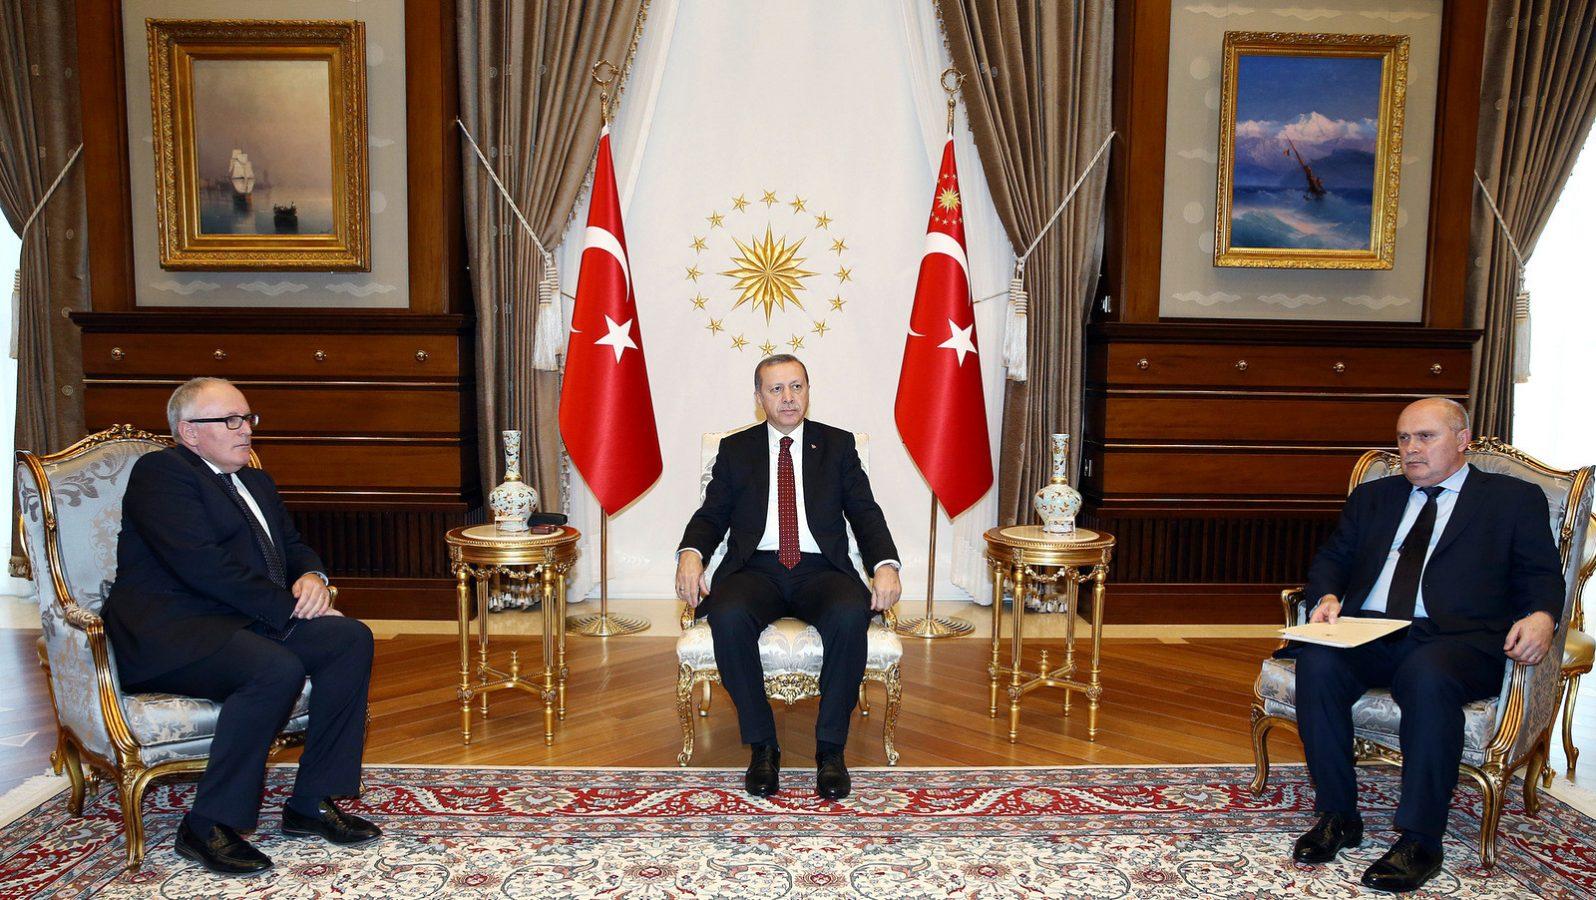 Recep Tayyip Erdoğan meeting Timmermans and Hahn in Istanbul on October 15, 2015 / ec.europa.eu